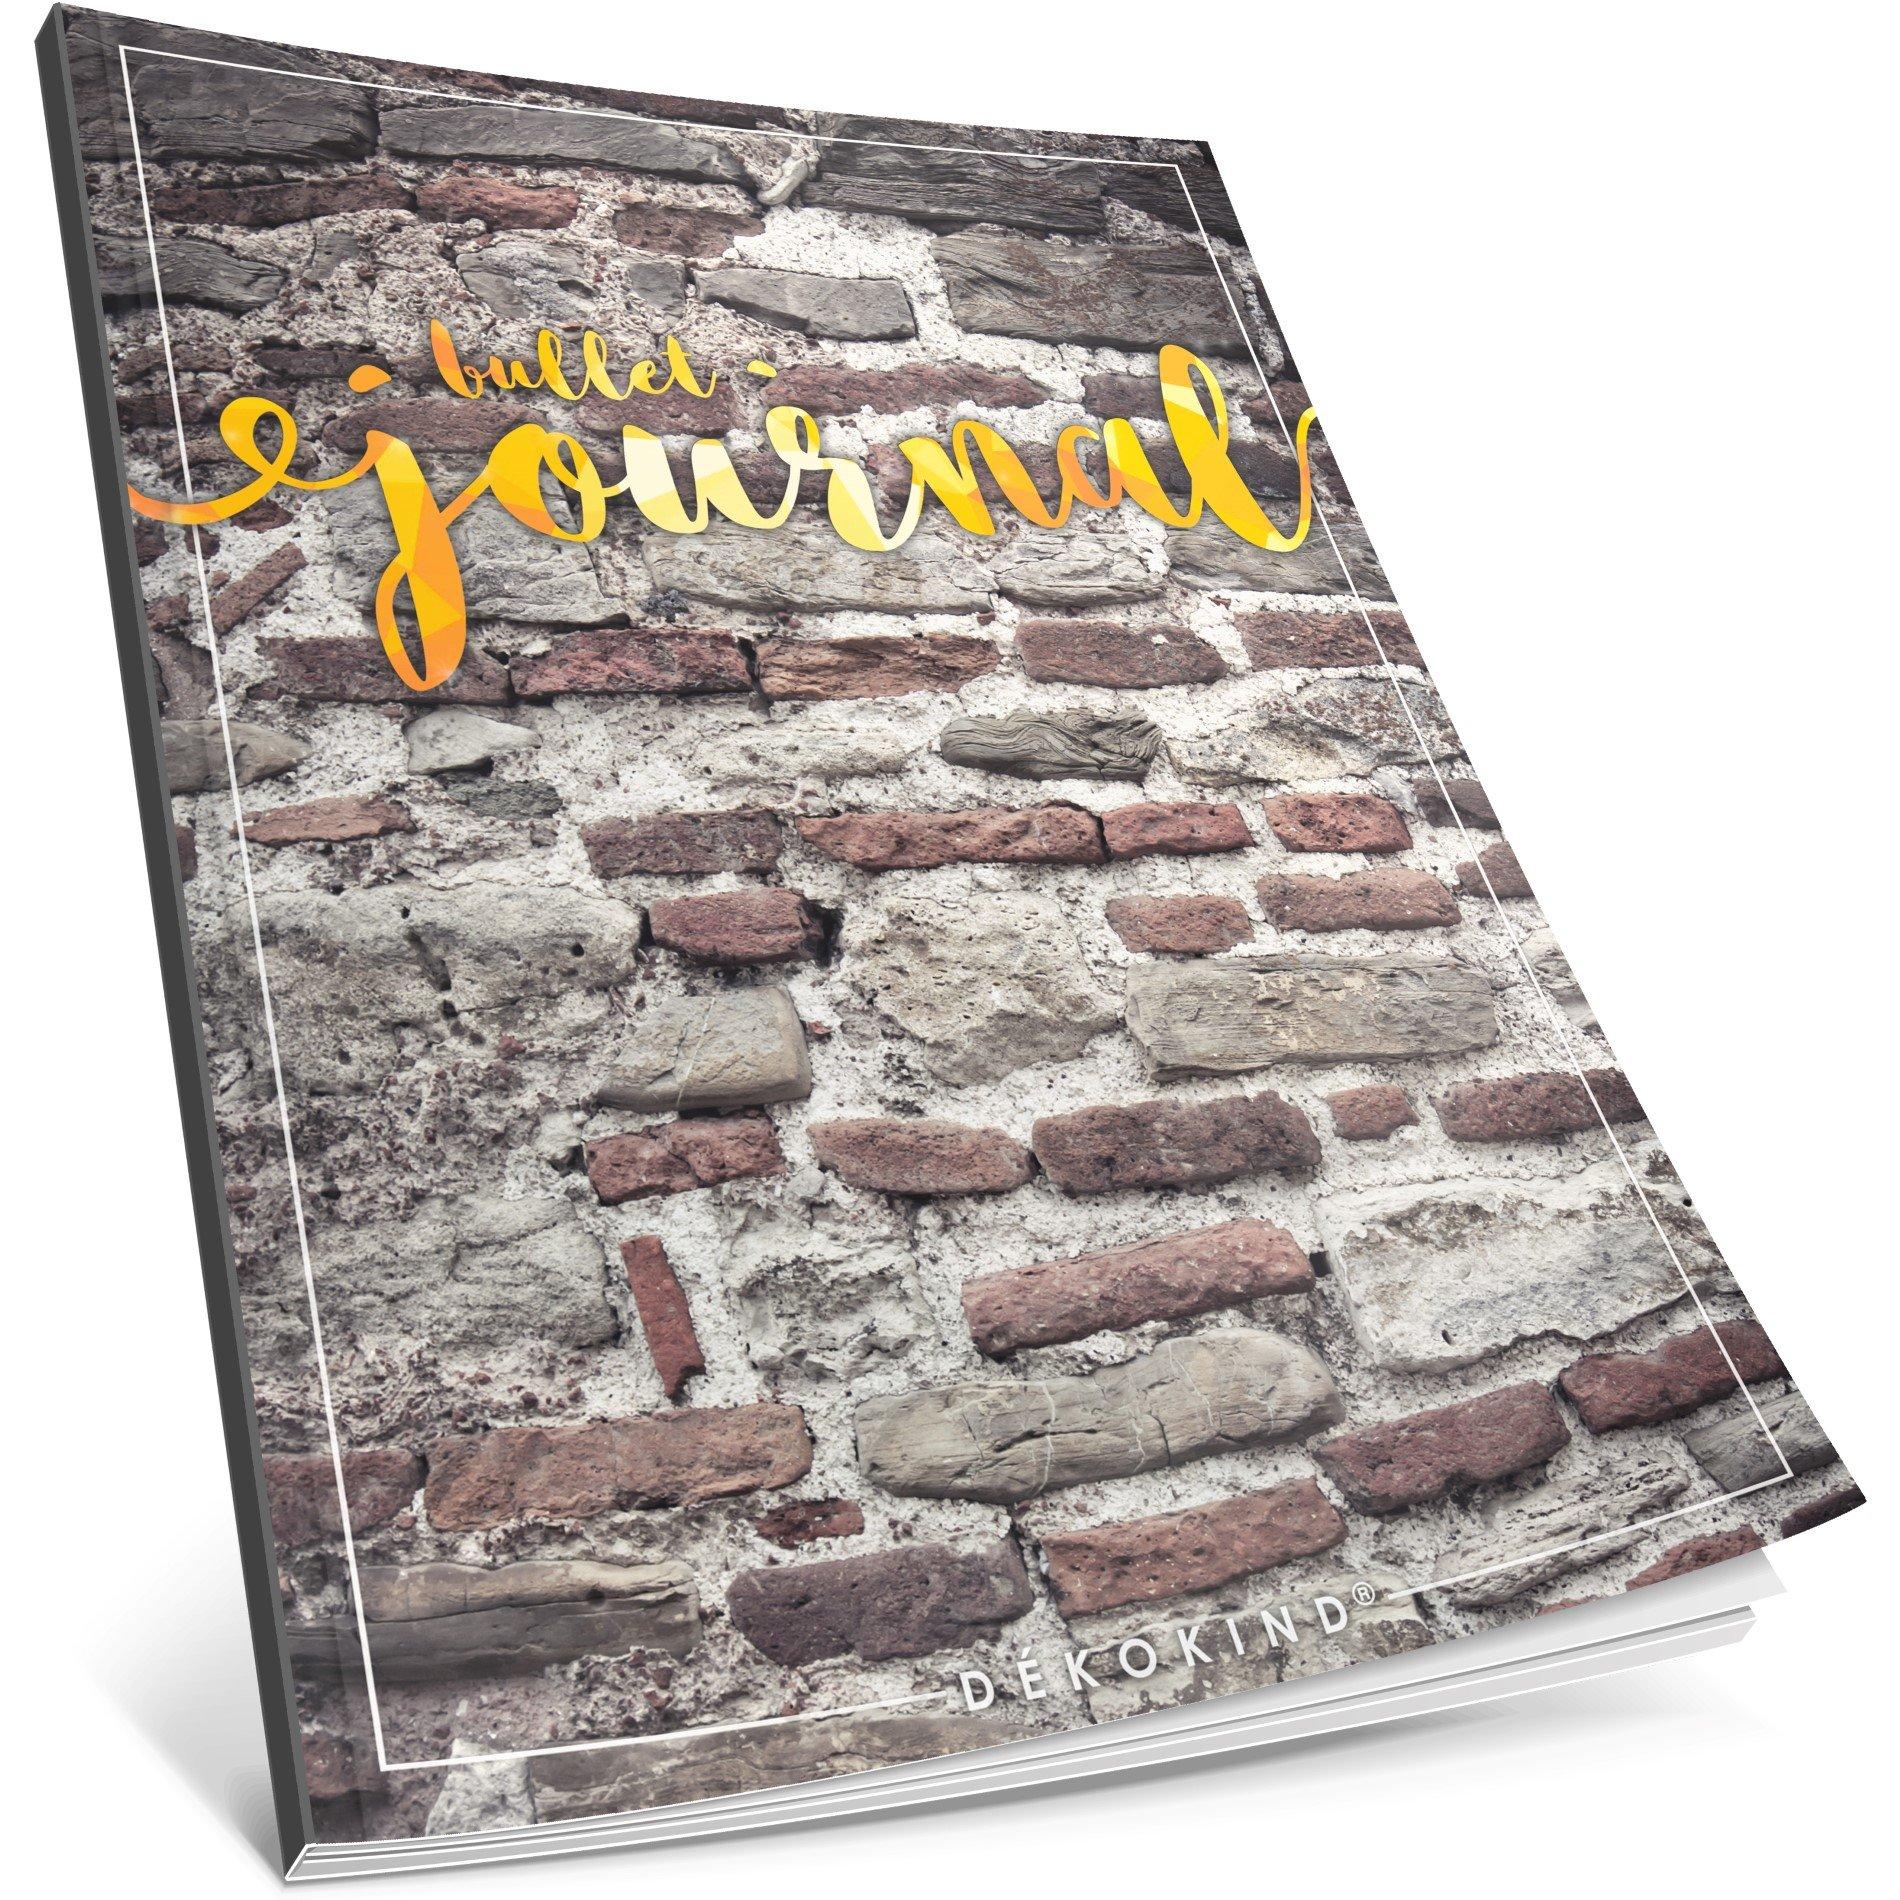 Dékokind® Bullet Journal: Ca. A4-Format • 100 Seiten, Punktraster Notizbuch mit Register • Dot Grid Notebook, Punktkariertes Papier, Skizzenbuch • ArtNr. 15 Backstein • Vintage Softcover